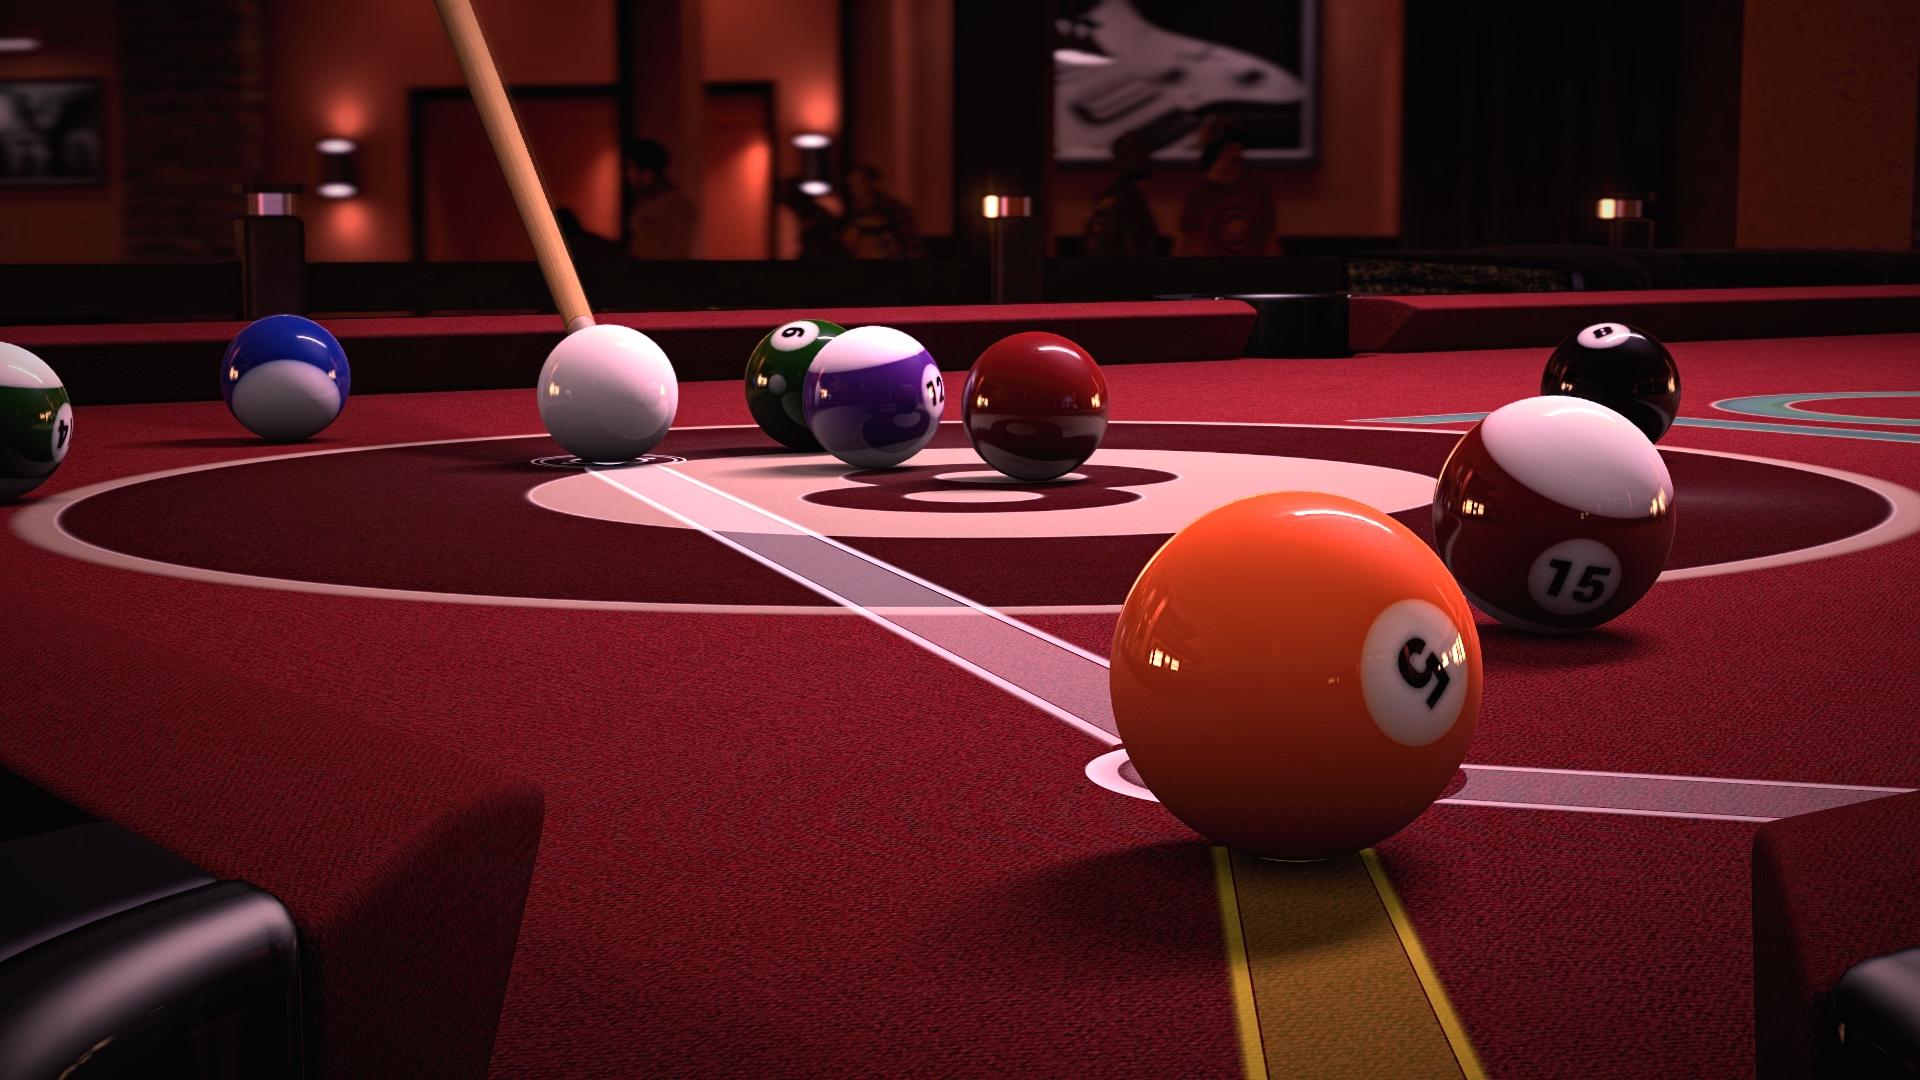 pure pool 8